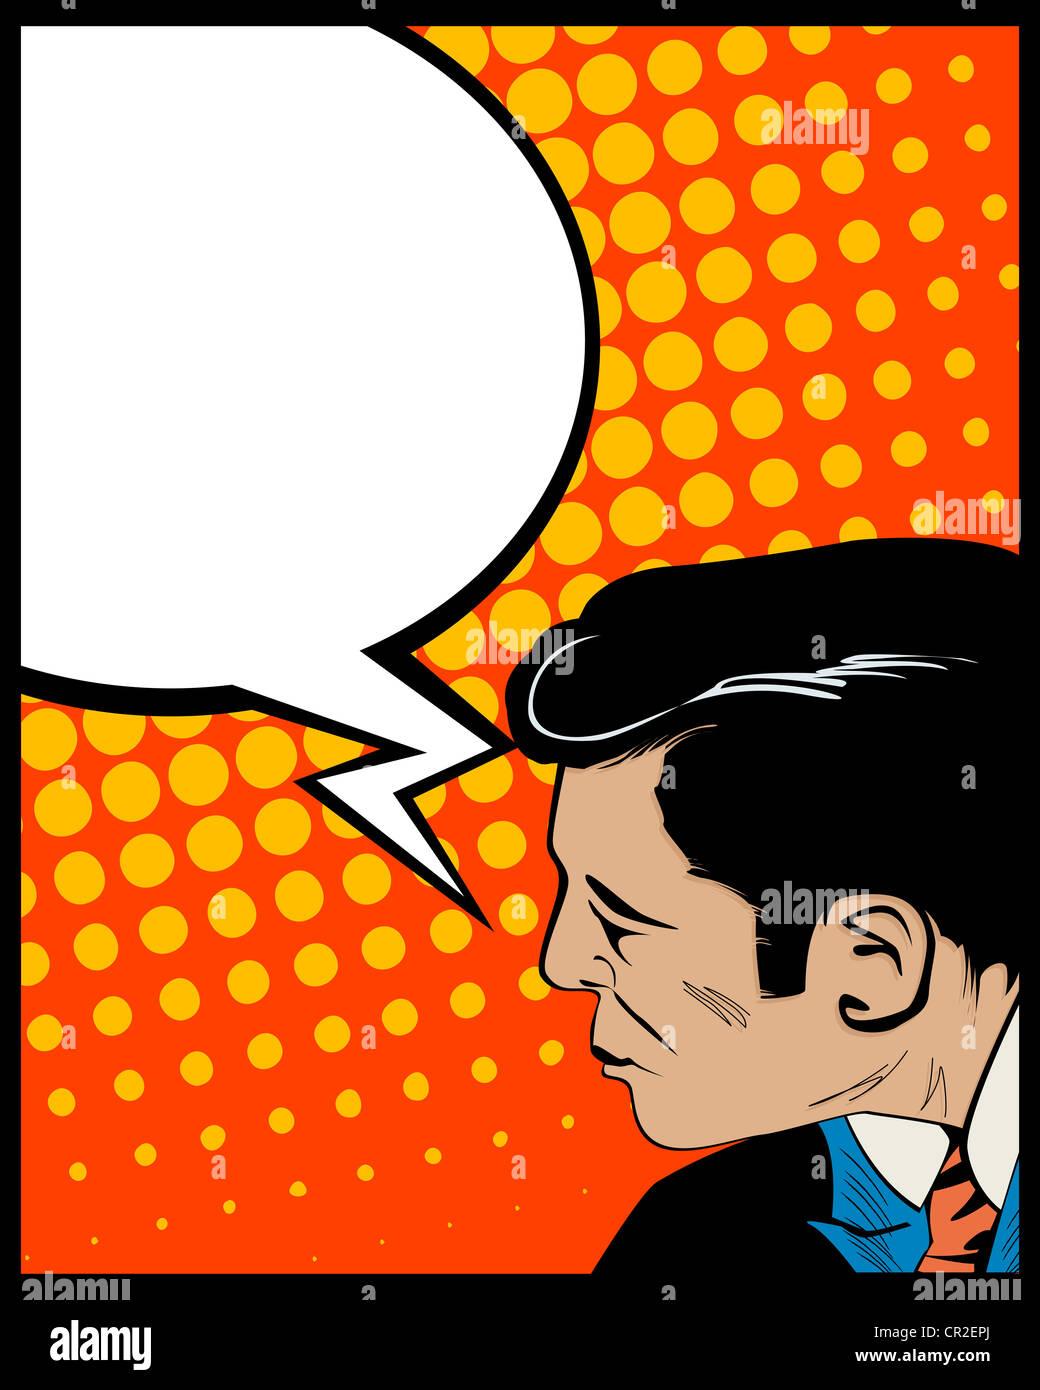 Pop-Art Style Grafik mit Mann und Speech bubble Stockfoto